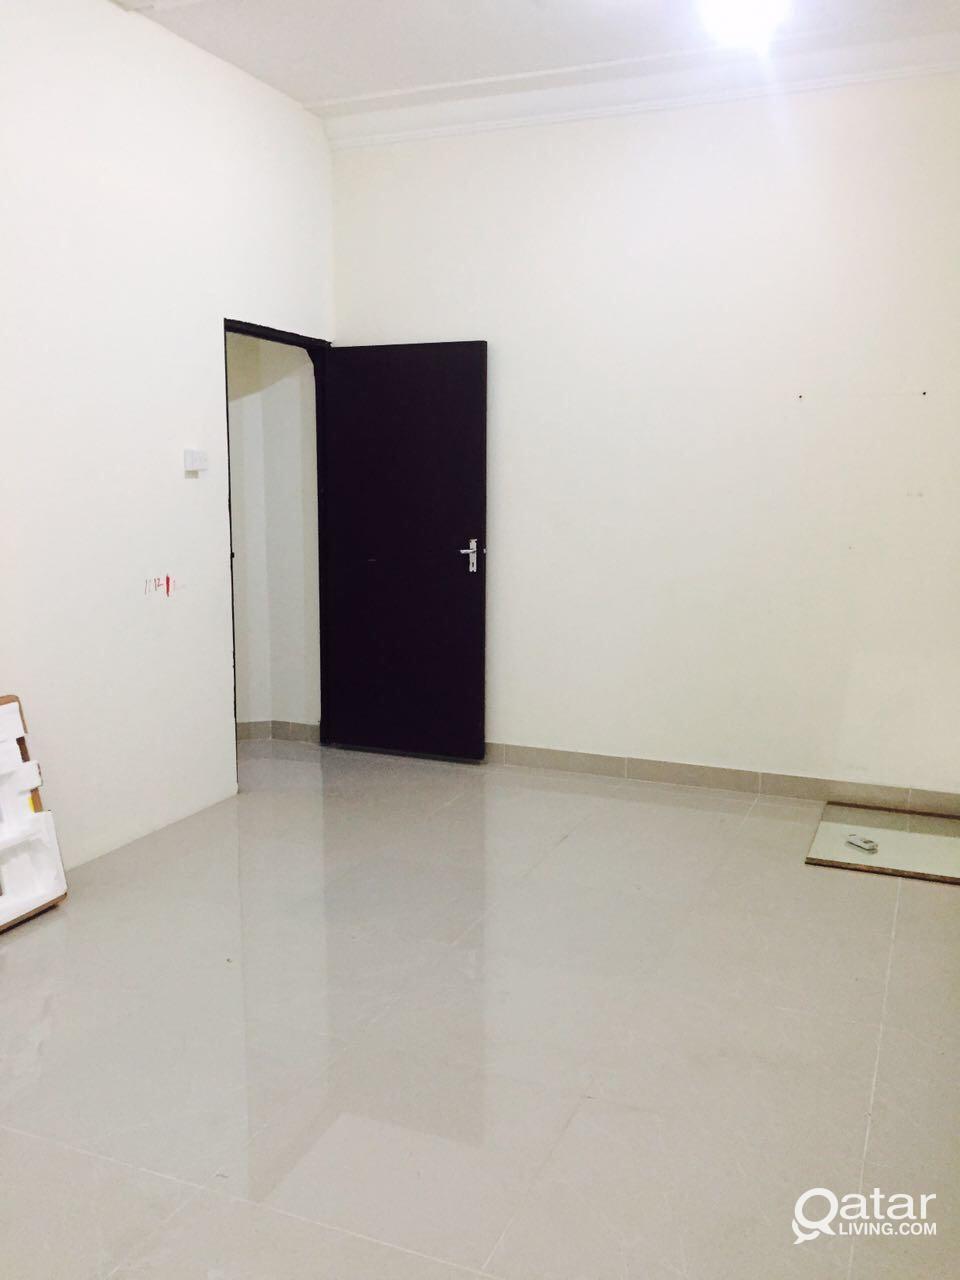 Family Room For Rent Qatar Living